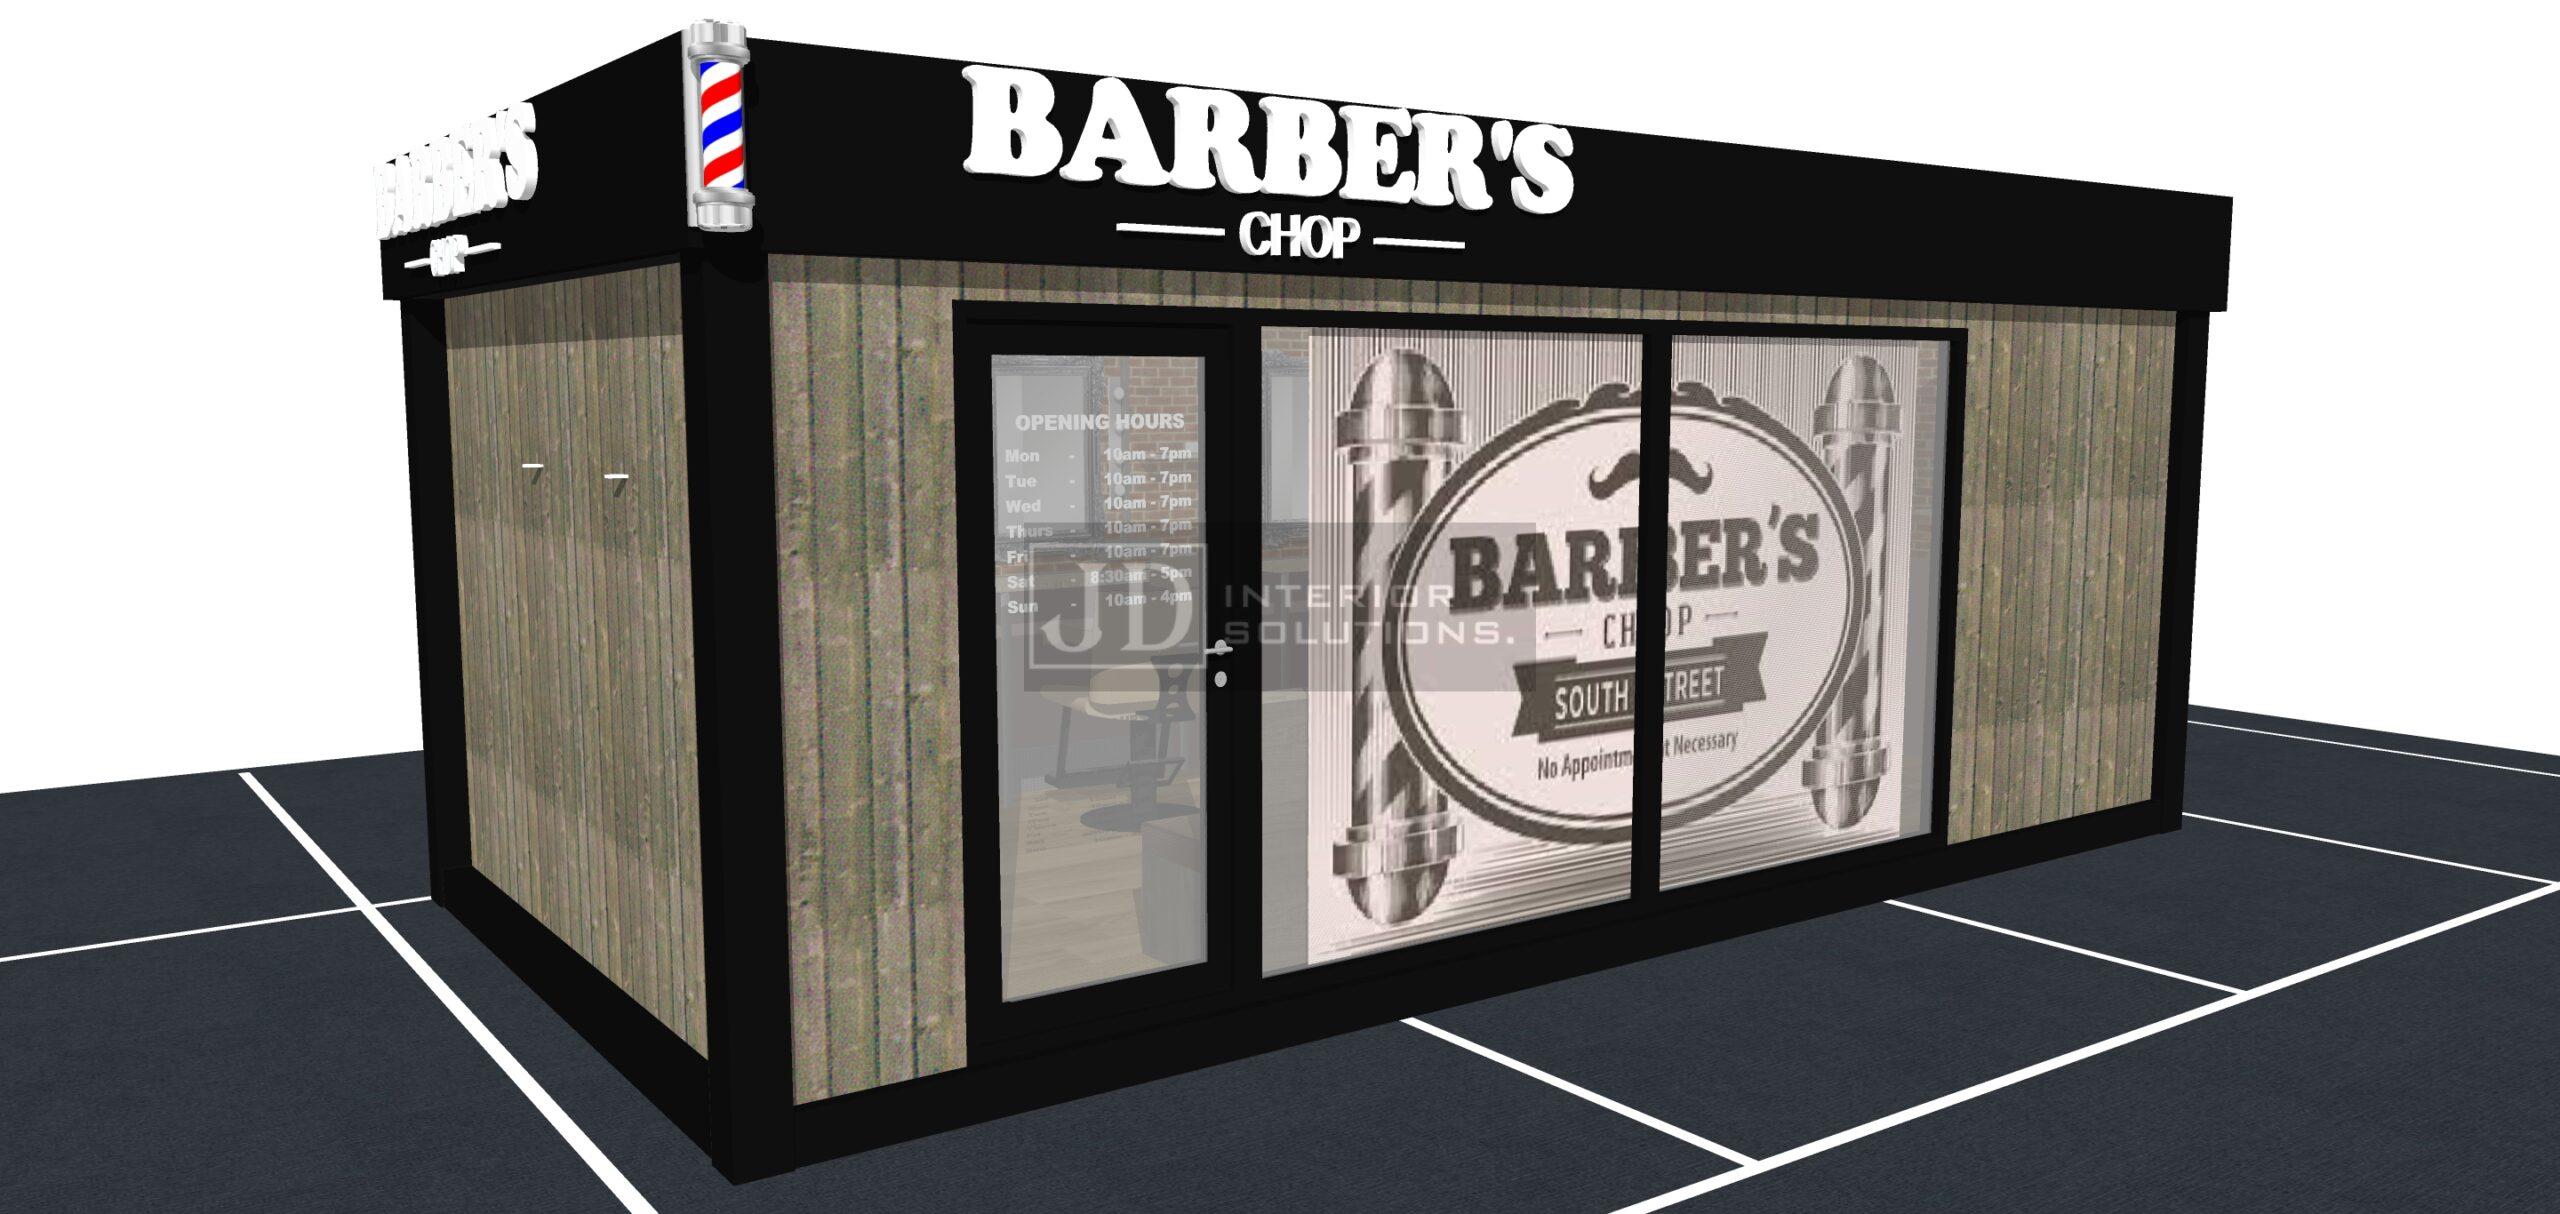 Barbers Chop 6.8m x 3.4m